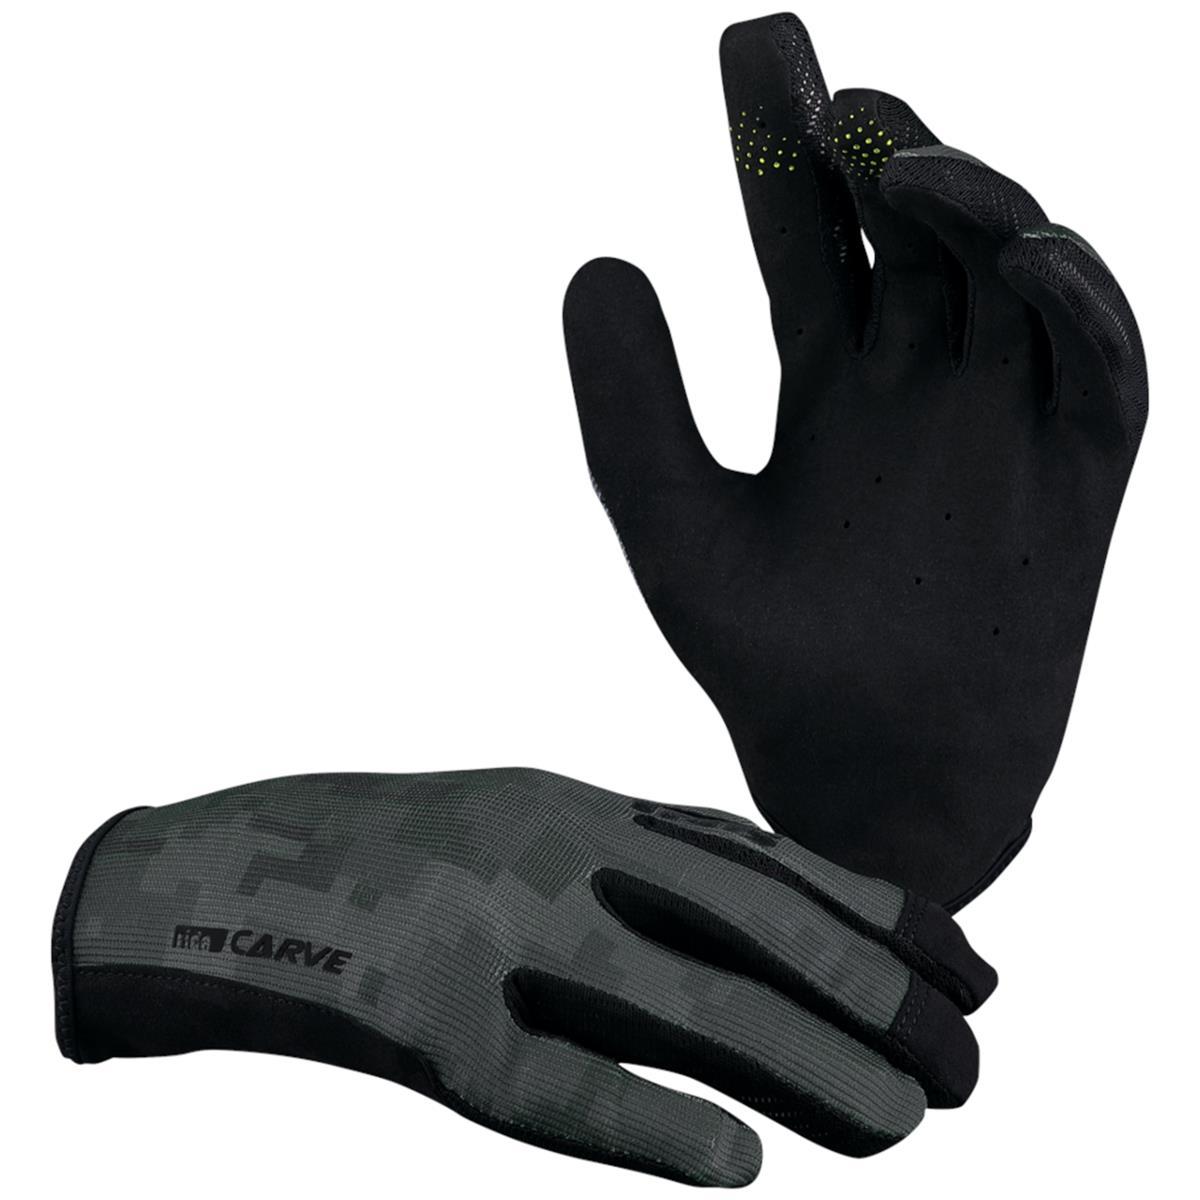 IXS Bike-Handschuhe Carve Schwarz/Camo